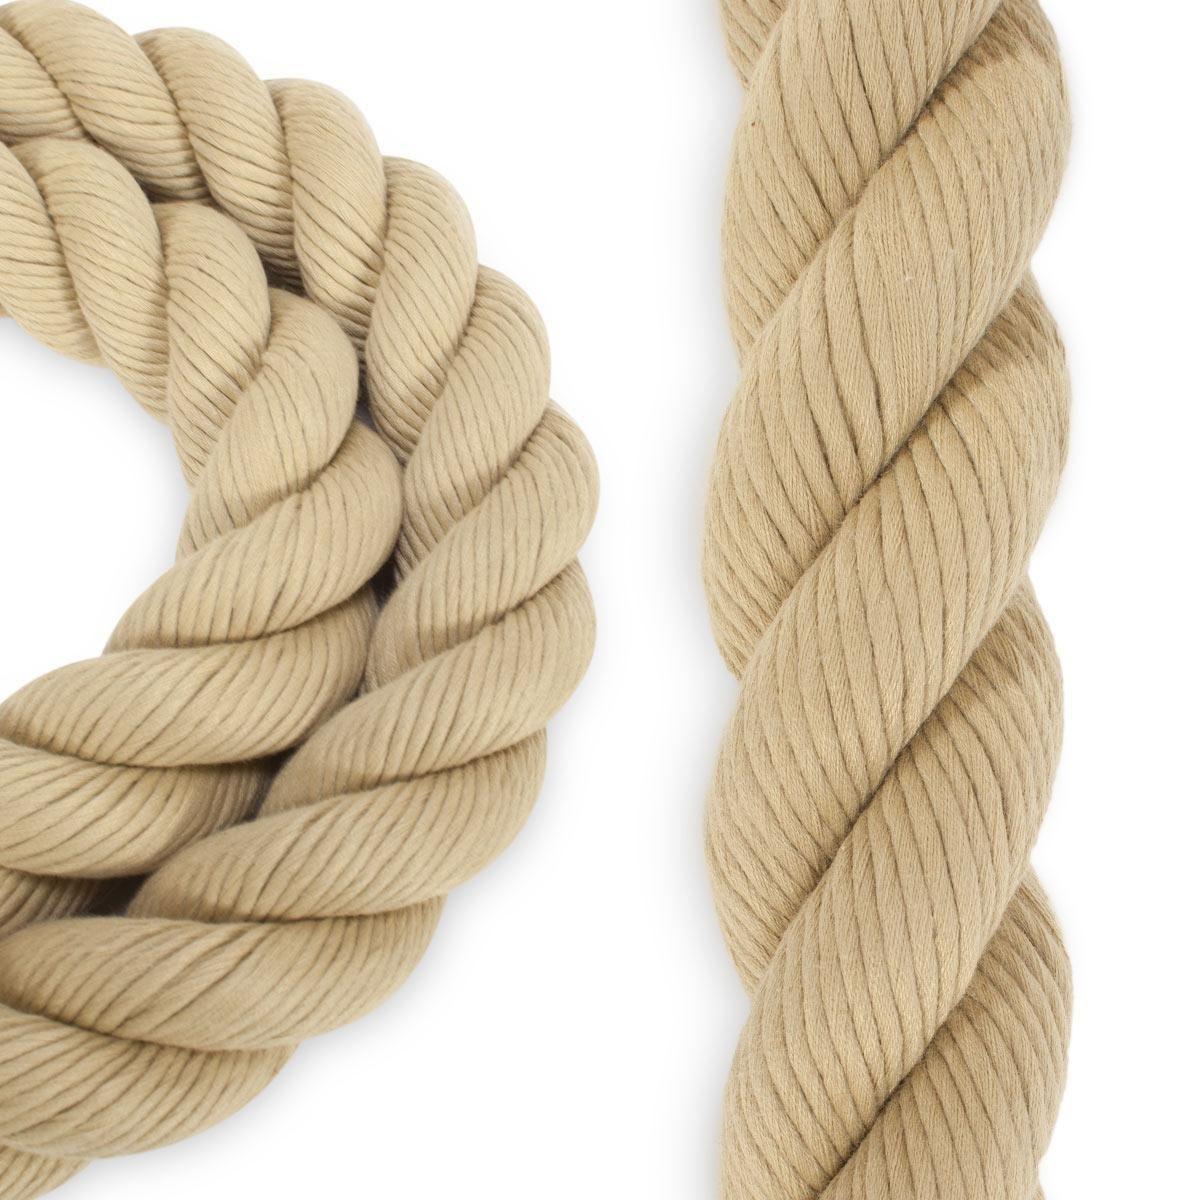 1 1 2 Polyester Combo Spun Fiber Tan In 2020 Rope Tan Manila Rope